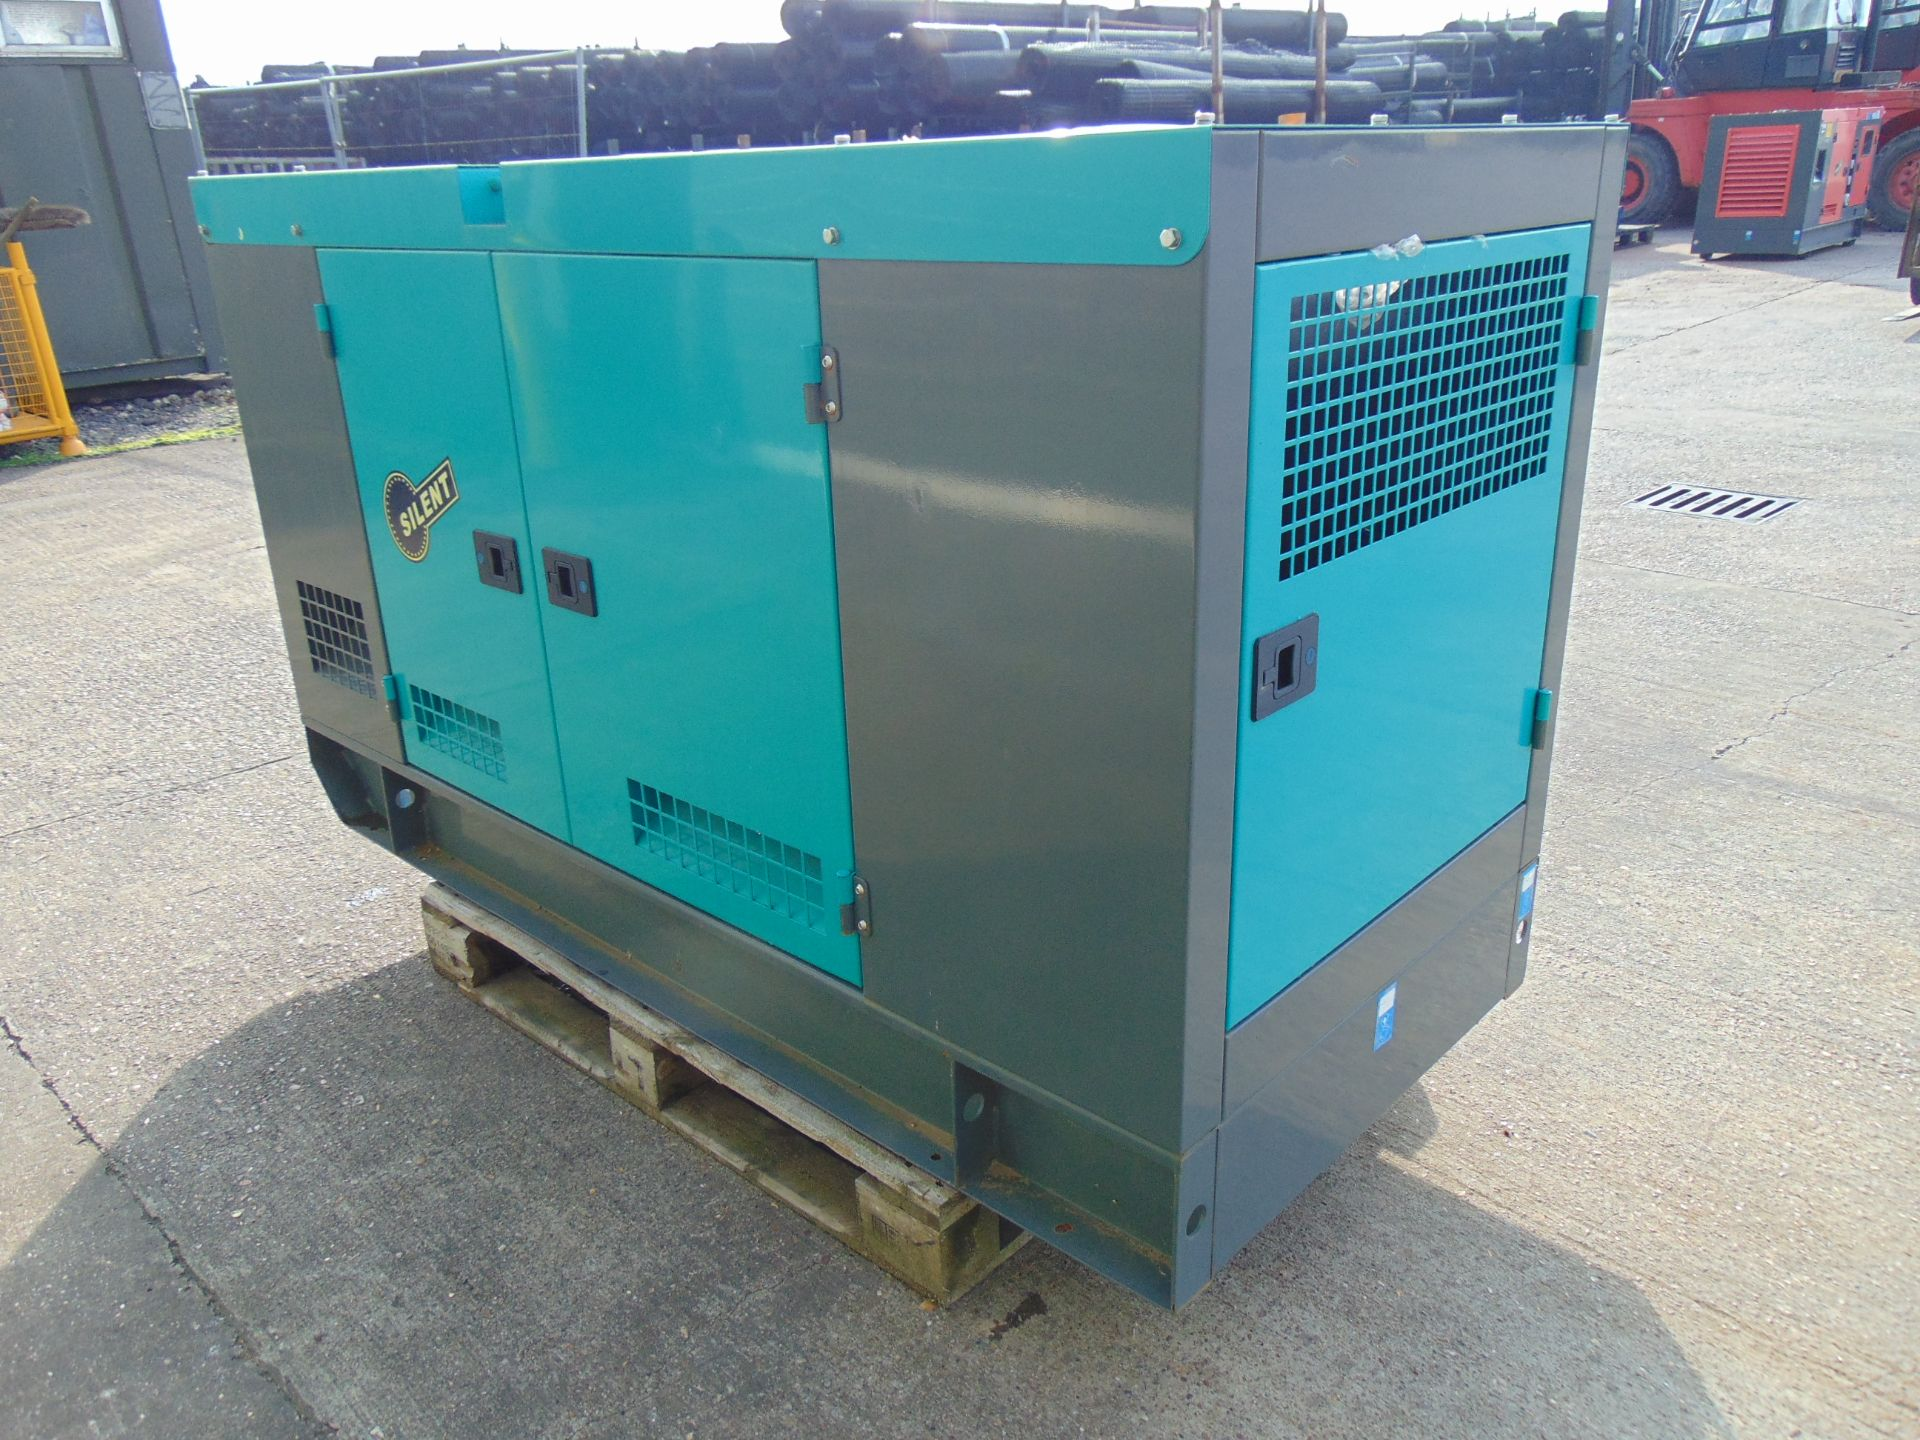 Lot 27 - UNISSUED 50 KVA 3 Phase Silent Diesel Generator Set